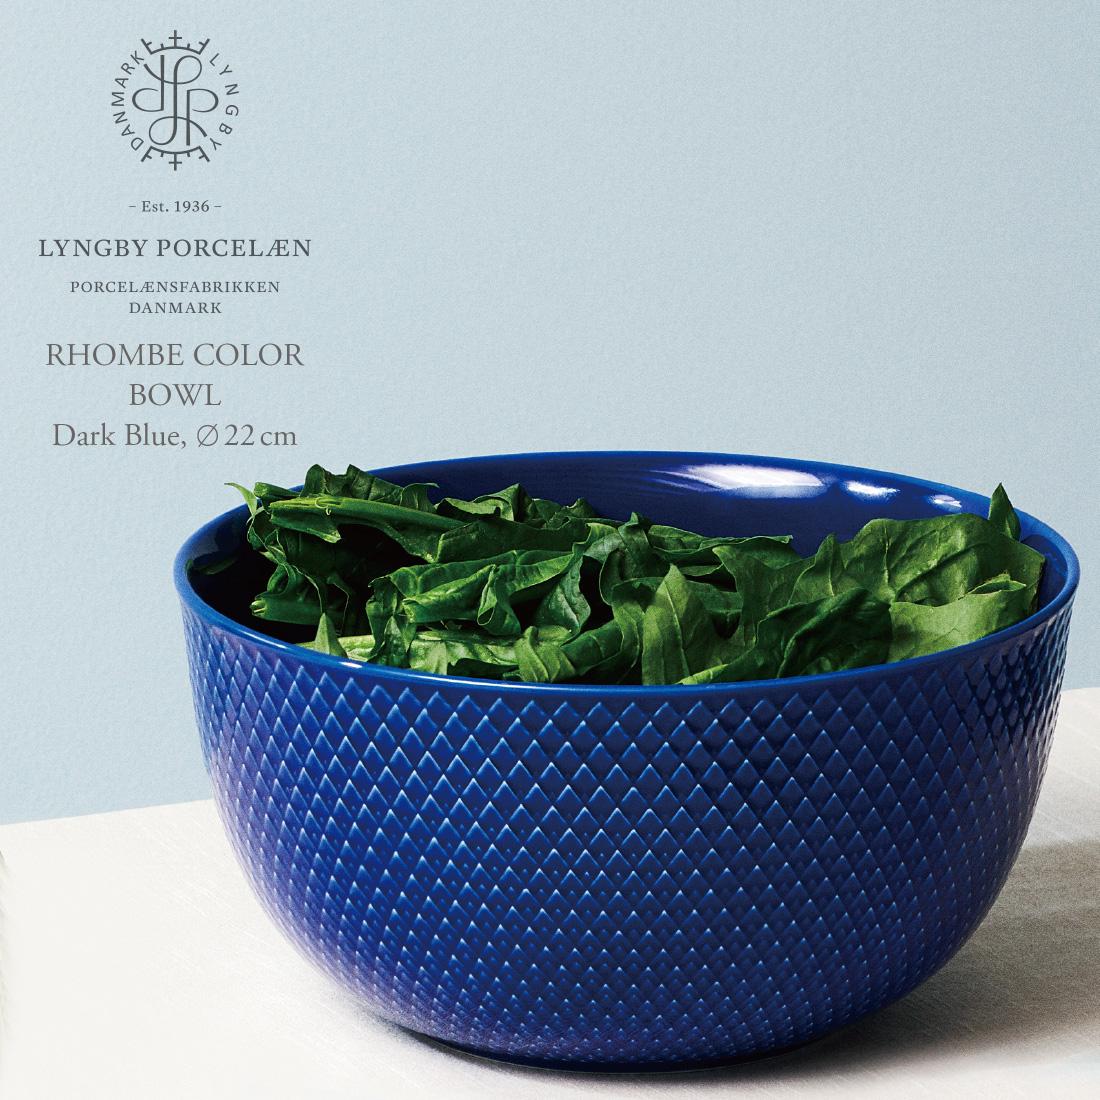 【LYNGBY PORCELAIN/リュンビュー・ポーセリン】RHOMBE COLOR BOWL 22cm/ロンブ/カラー/ボウル/STILLEBEN/Dark Blue/Porcelain/鉢/食器/スティルレーベン/ダークブルー/コンビニ受取対応